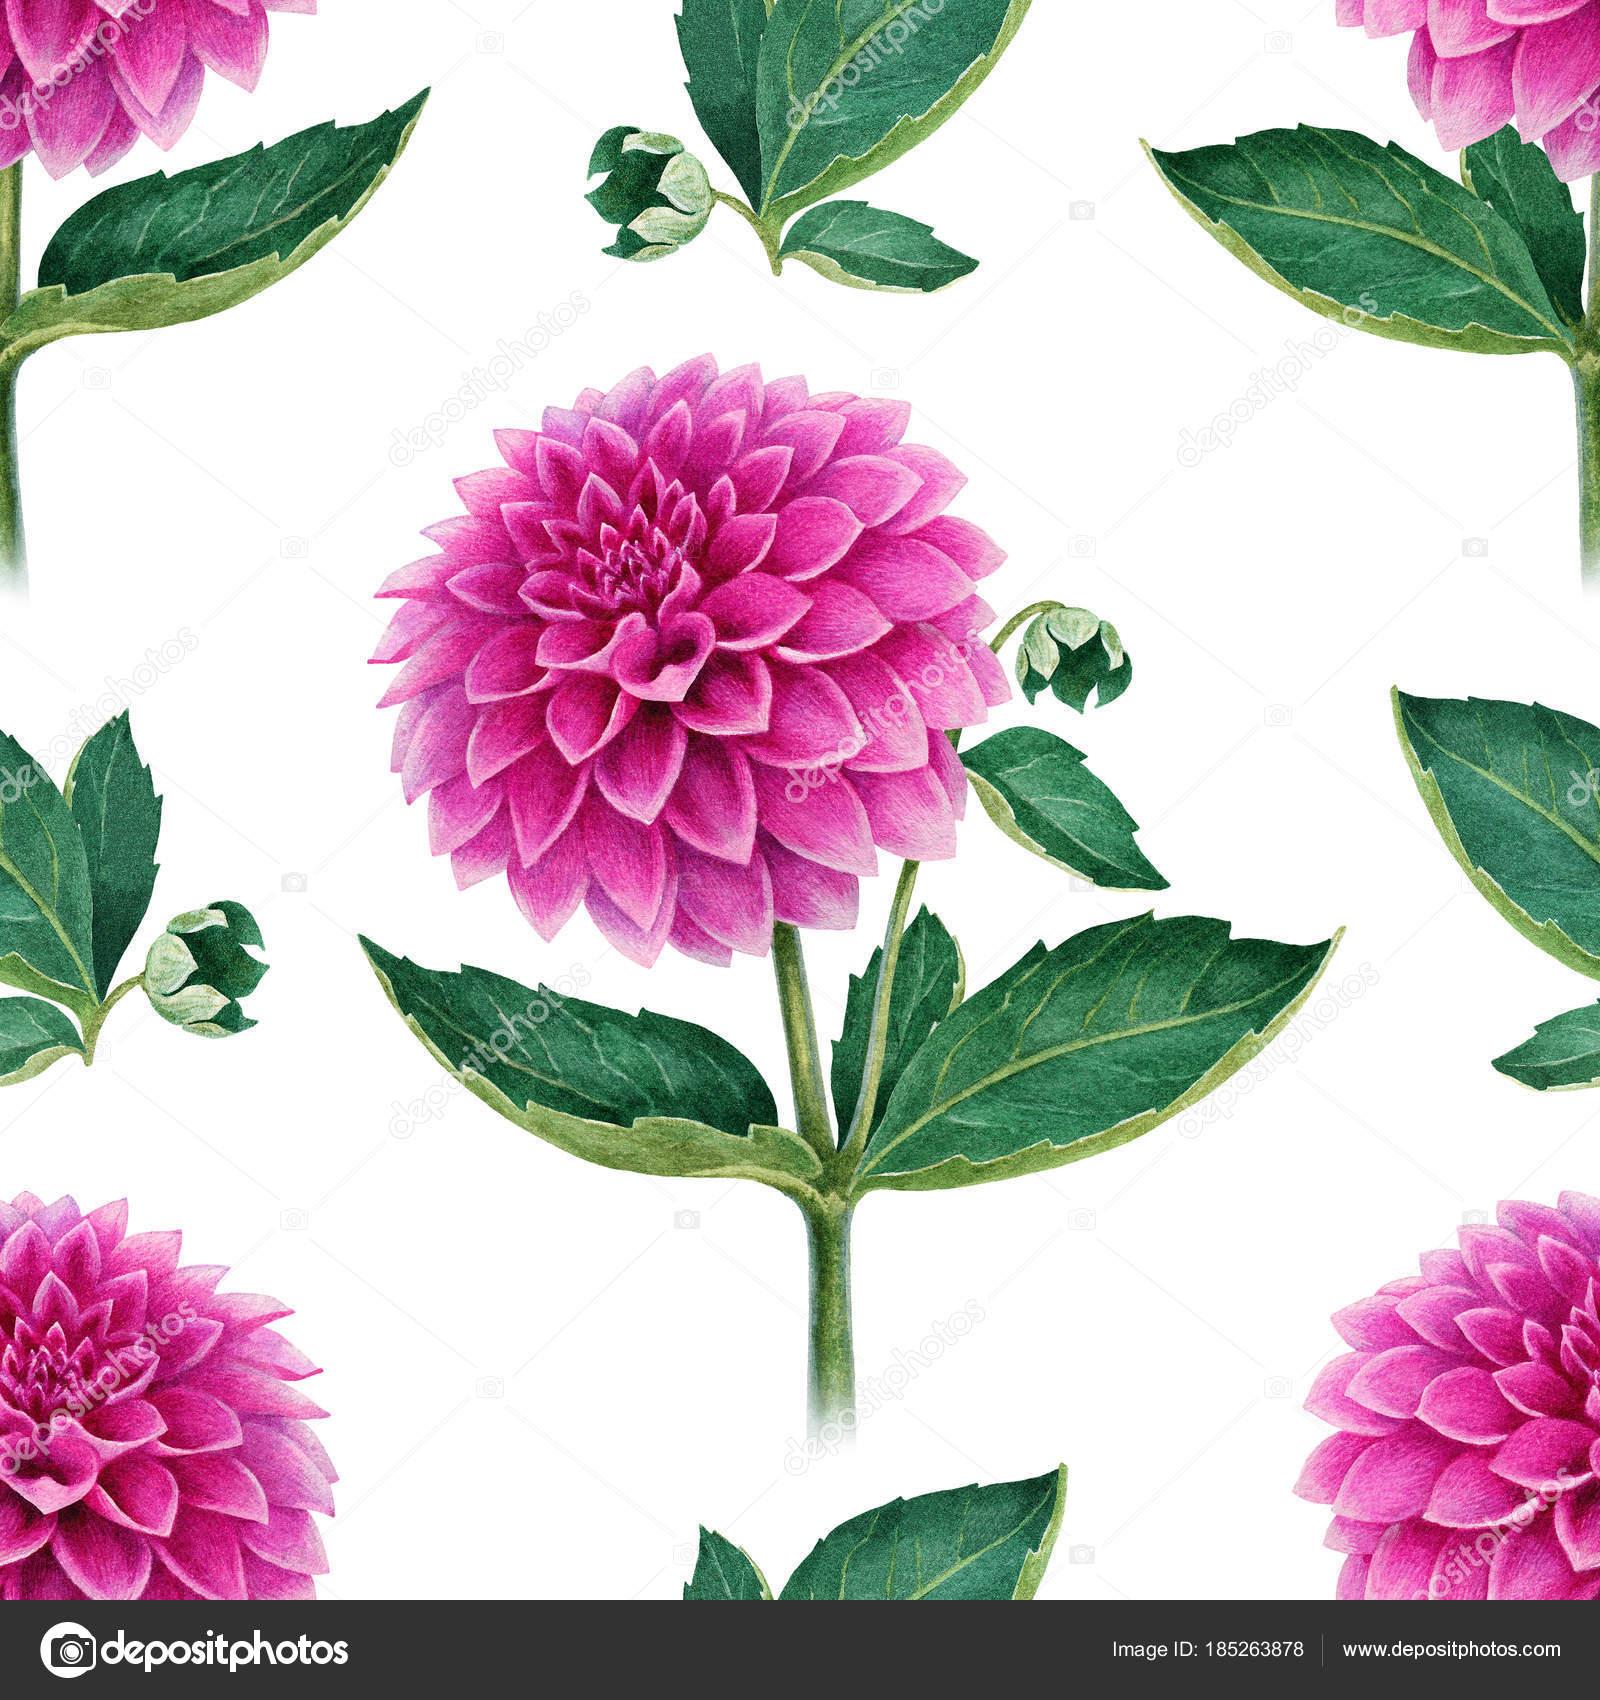 Watercolor illustration of dahlia flowers seamless pattern stock watercolor illustration of dahlia flowers seamless pattern stock photo izmirmasajfo